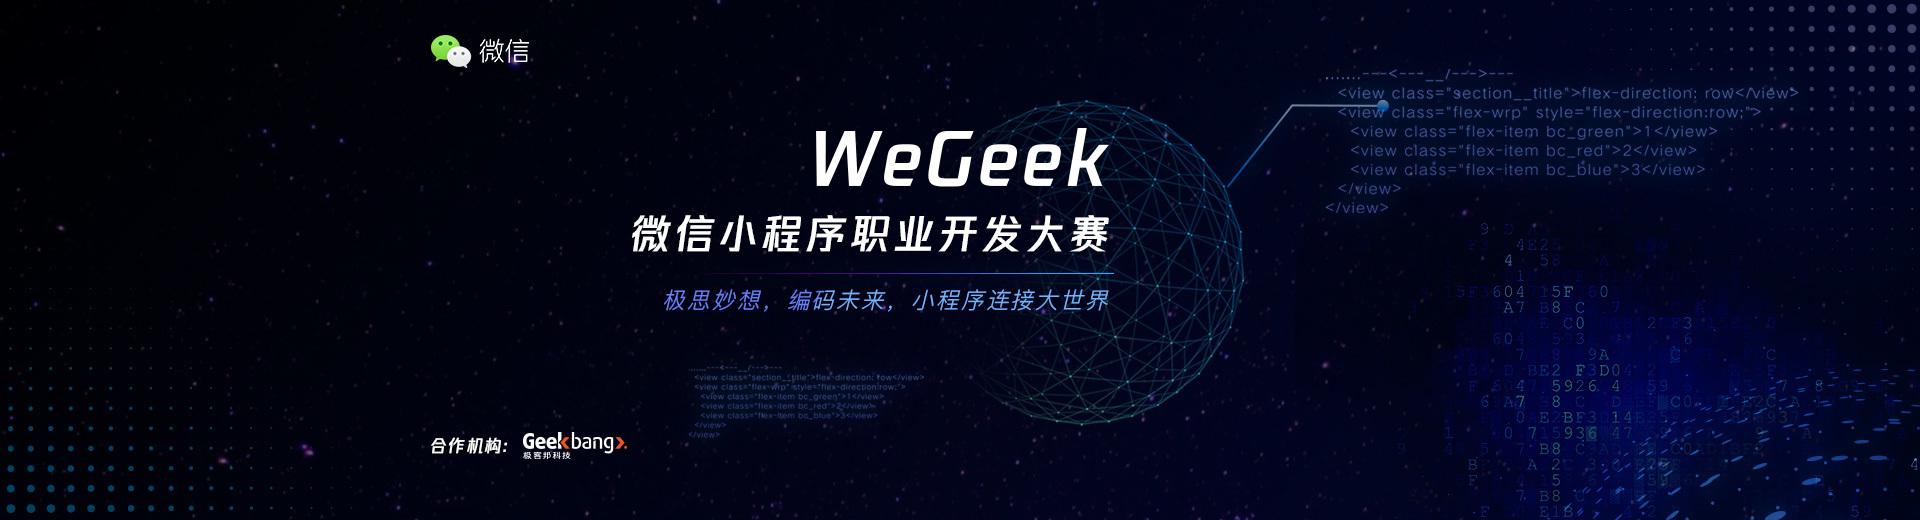 WeGeek微信小程序职业开发大赛